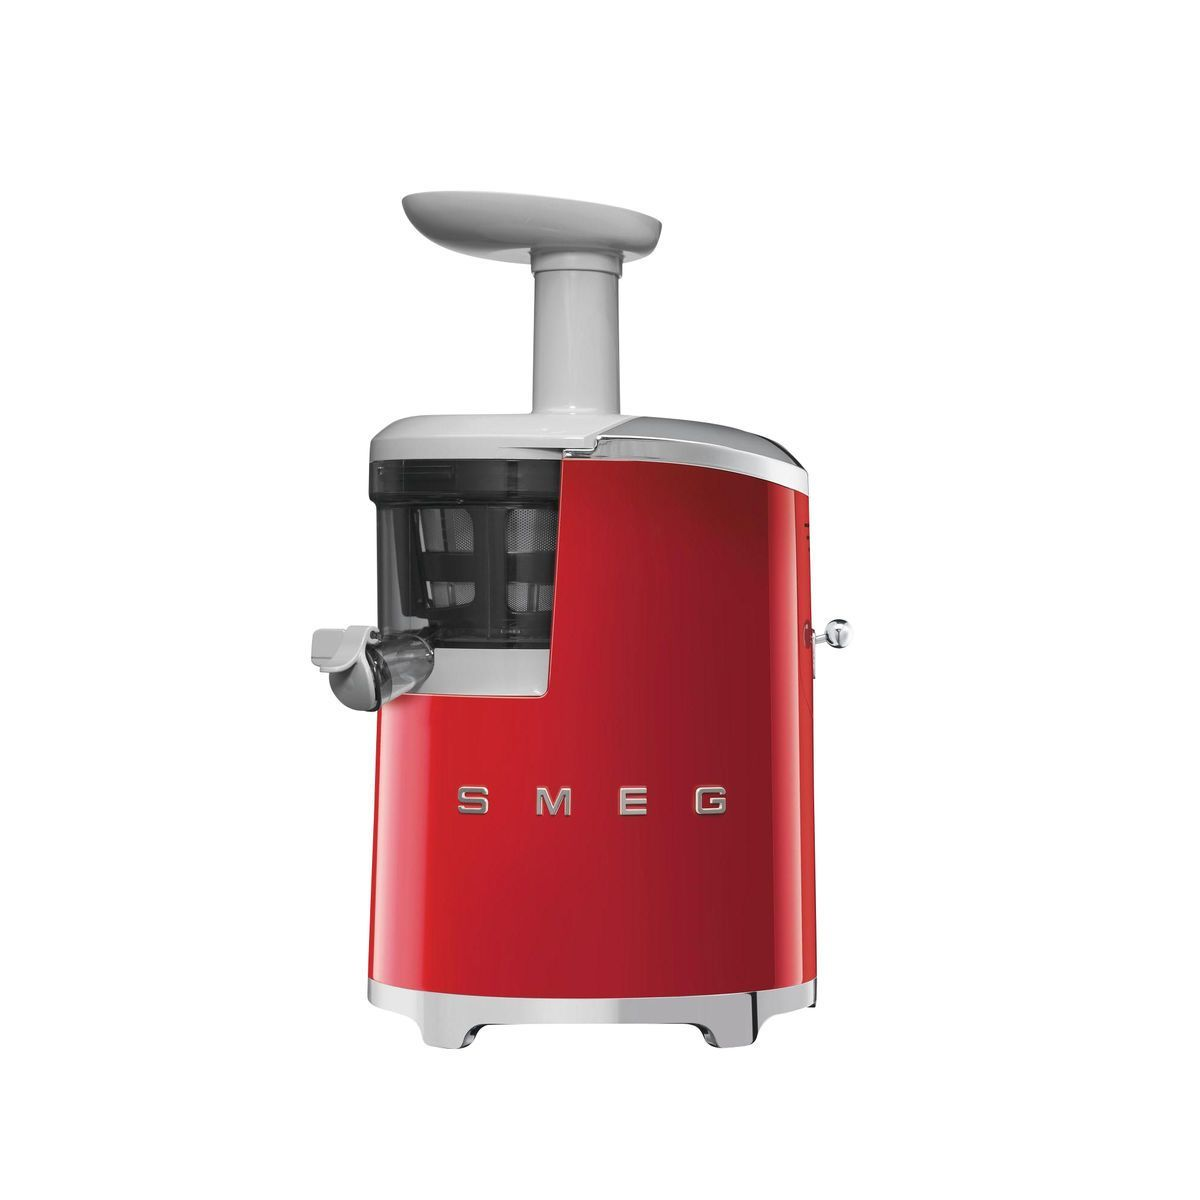 Slow Juicer Recipe : SJF01 Slow Juicer Smeg AmbienteDirect.com